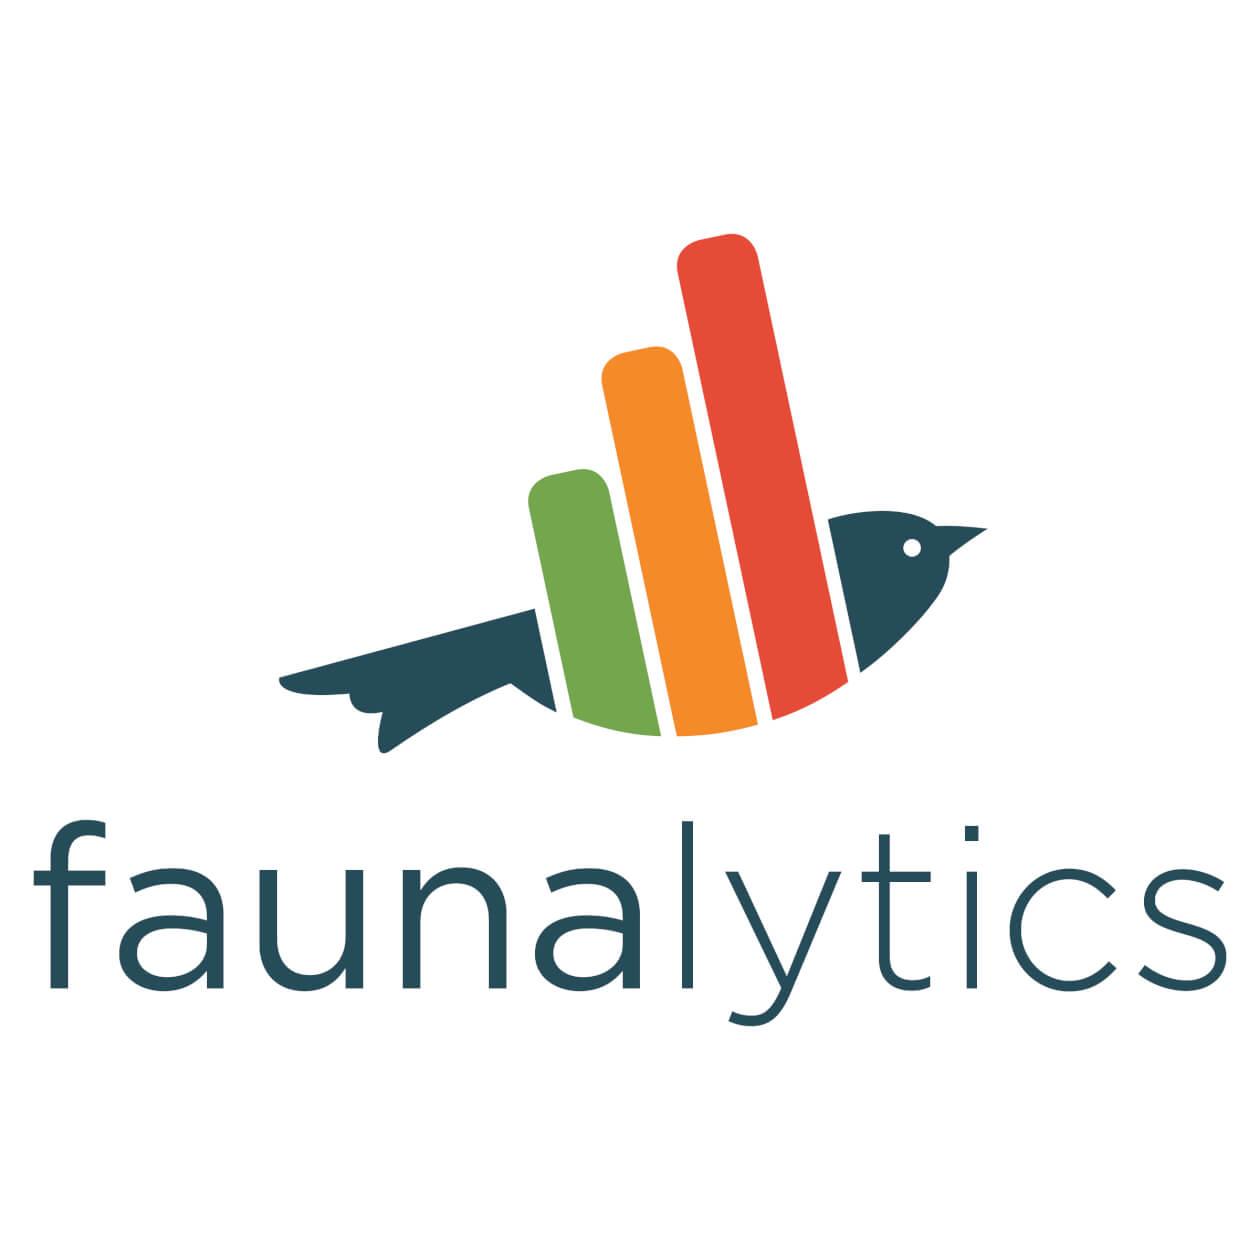 Faunalytics